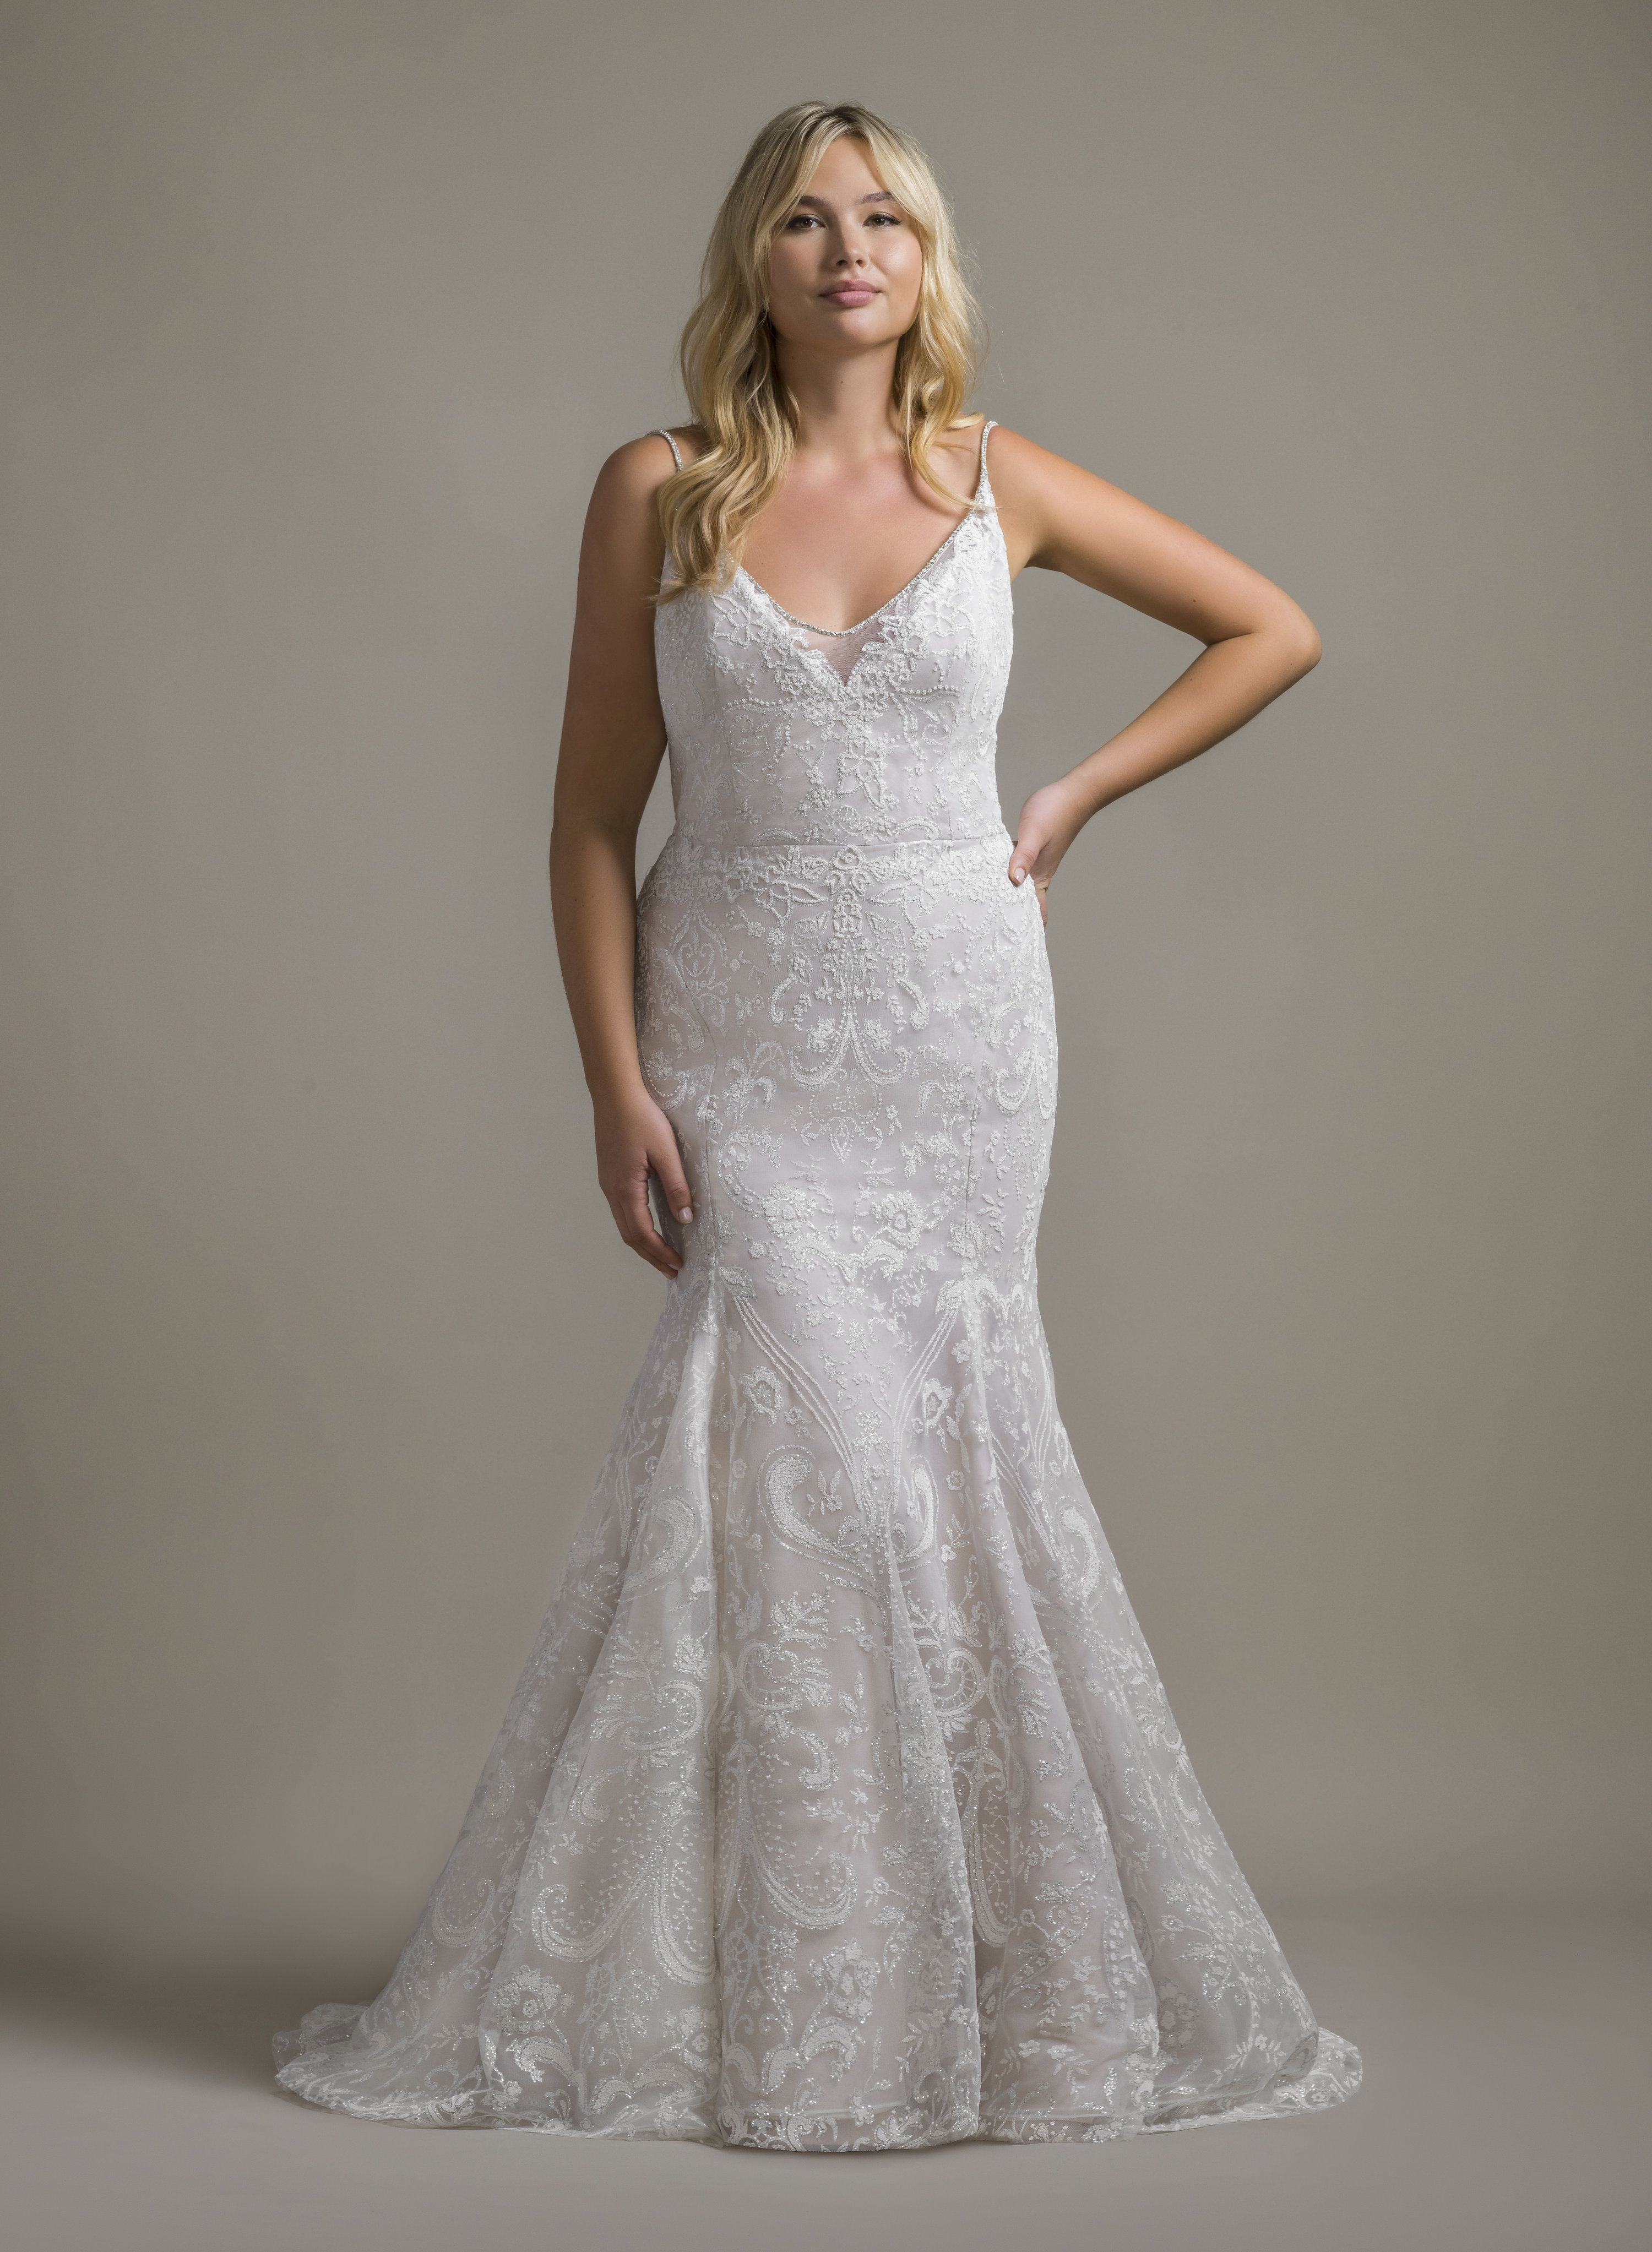 Plus Sized Wedding Dresses Corset Bows Plussizedweddingdressescheap Curvy Wedding Dress Lace Wedding Dress Vintage Plus Size Wedding Gowns [ 2048 x 1536 Pixel ]